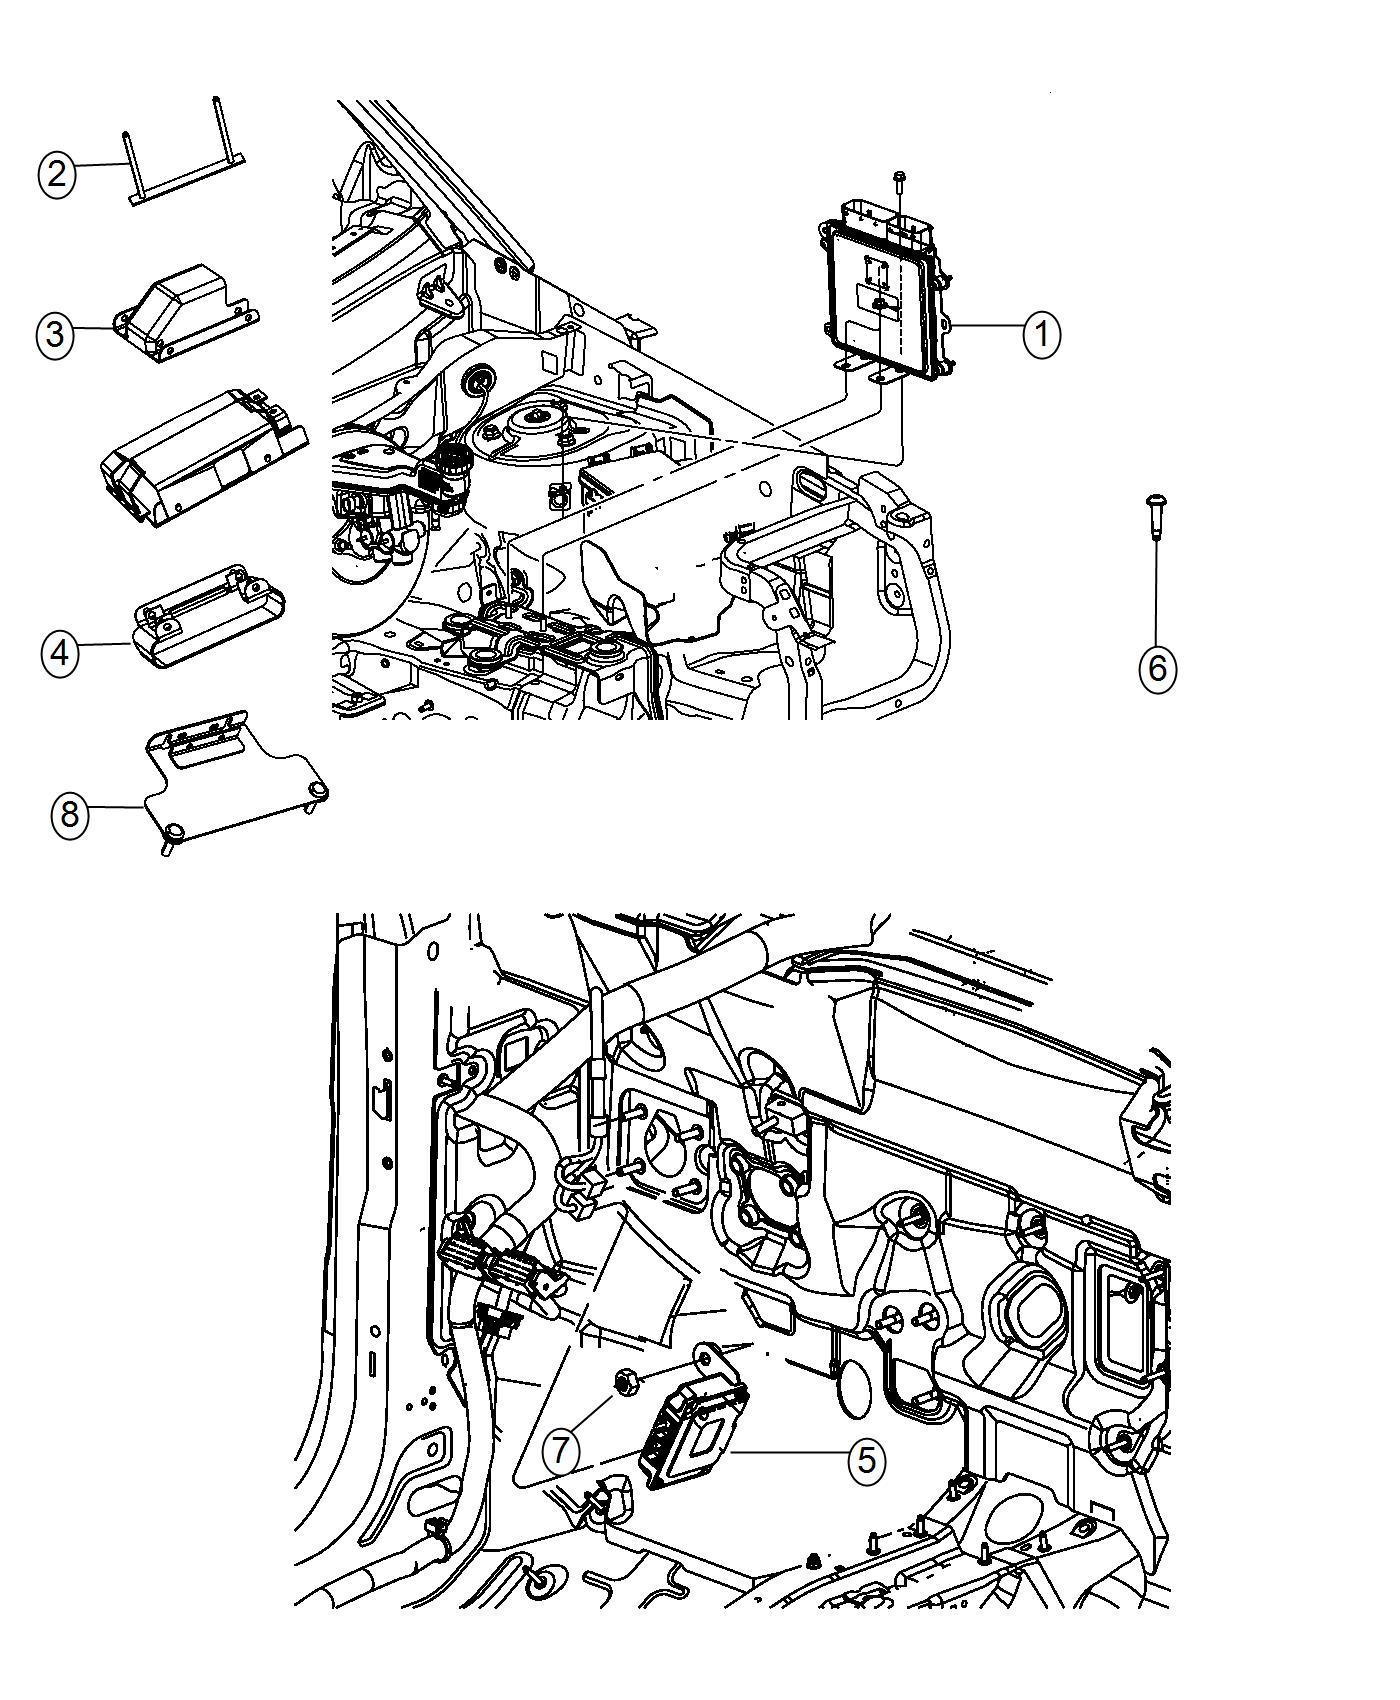 2016 Jeep Compass Bracket. Transmission control module